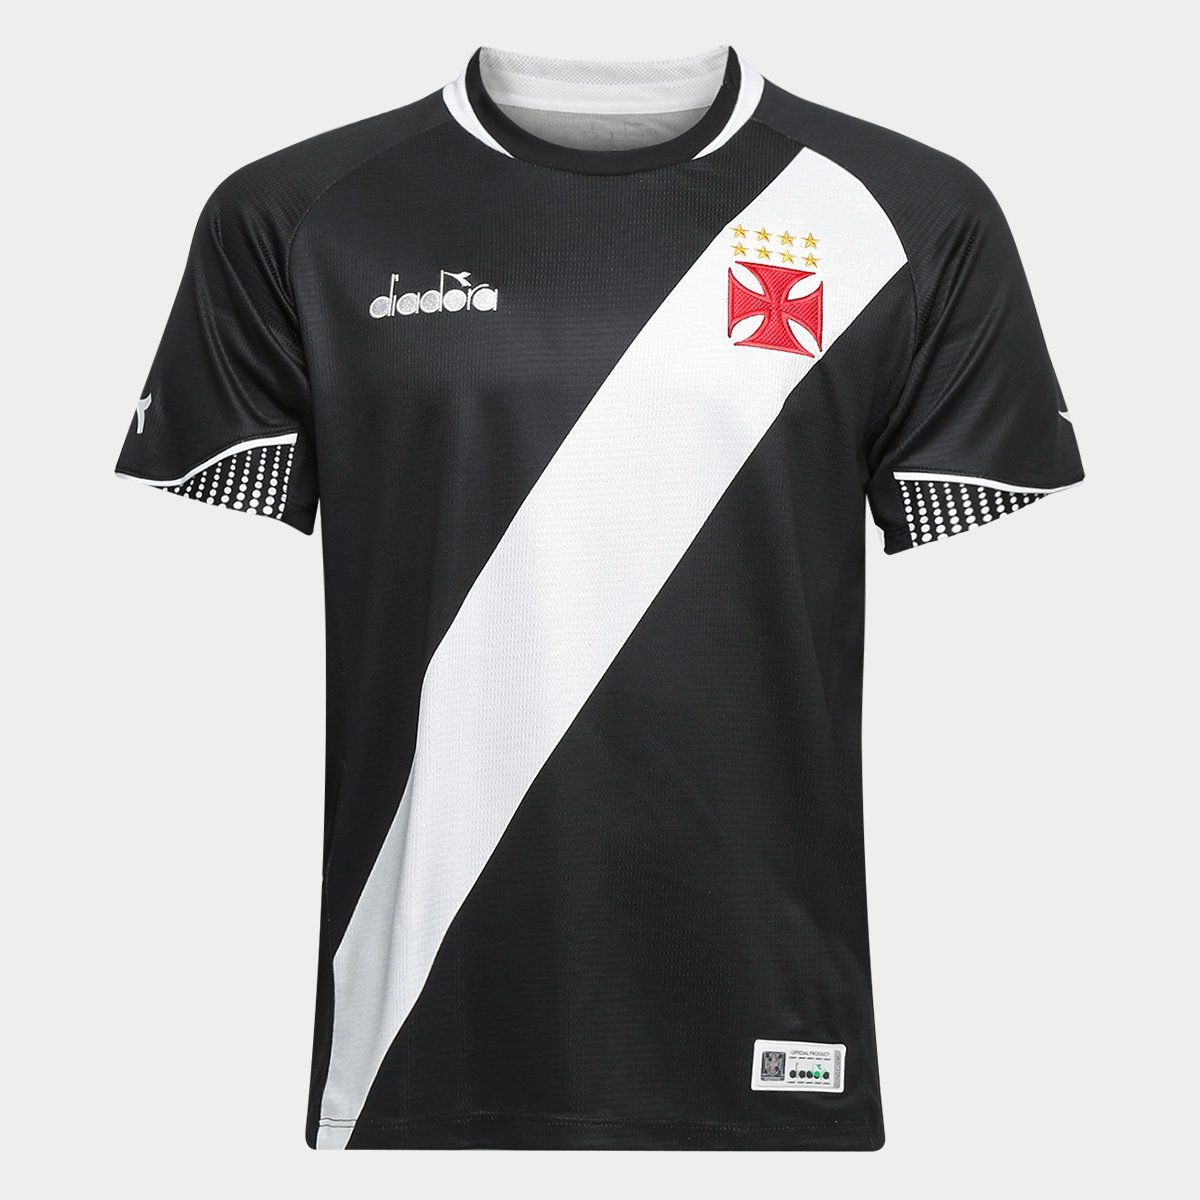 4e78a6cf89 Camisa Vasco I 2018 s n° - Torcedor Diadora Masculina .